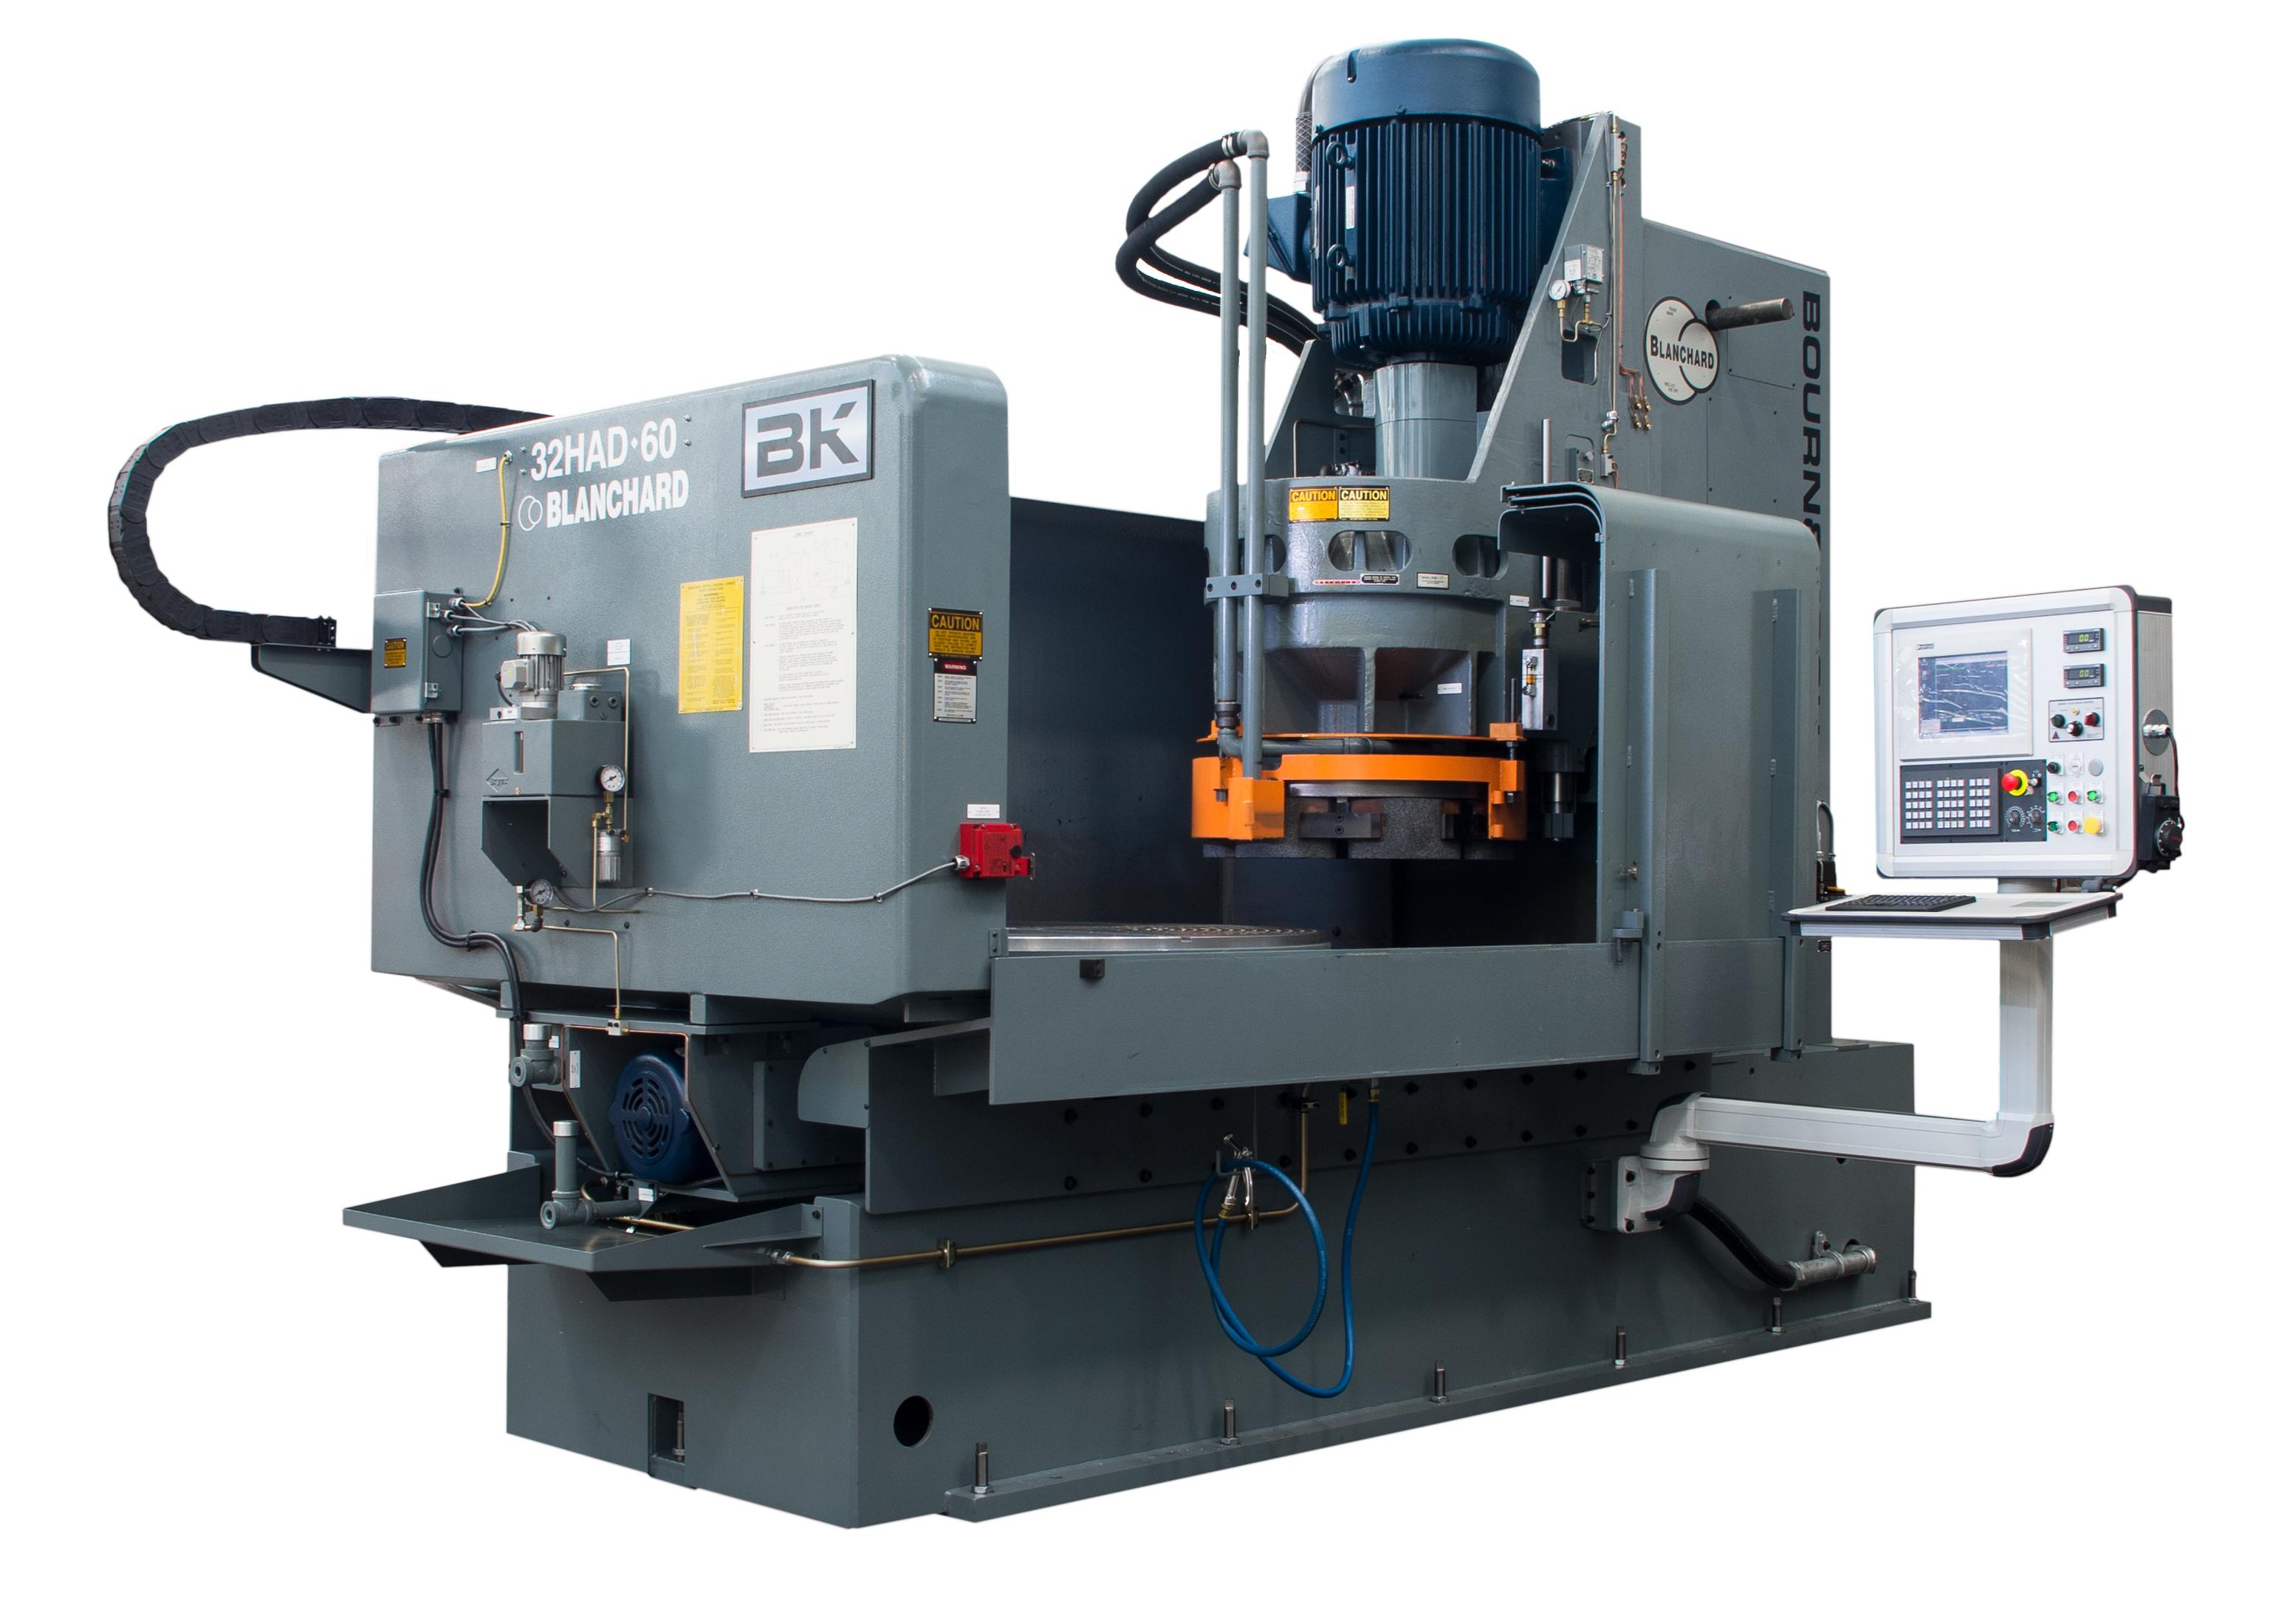 New u0026 Reman CNC Blanchard Grinder